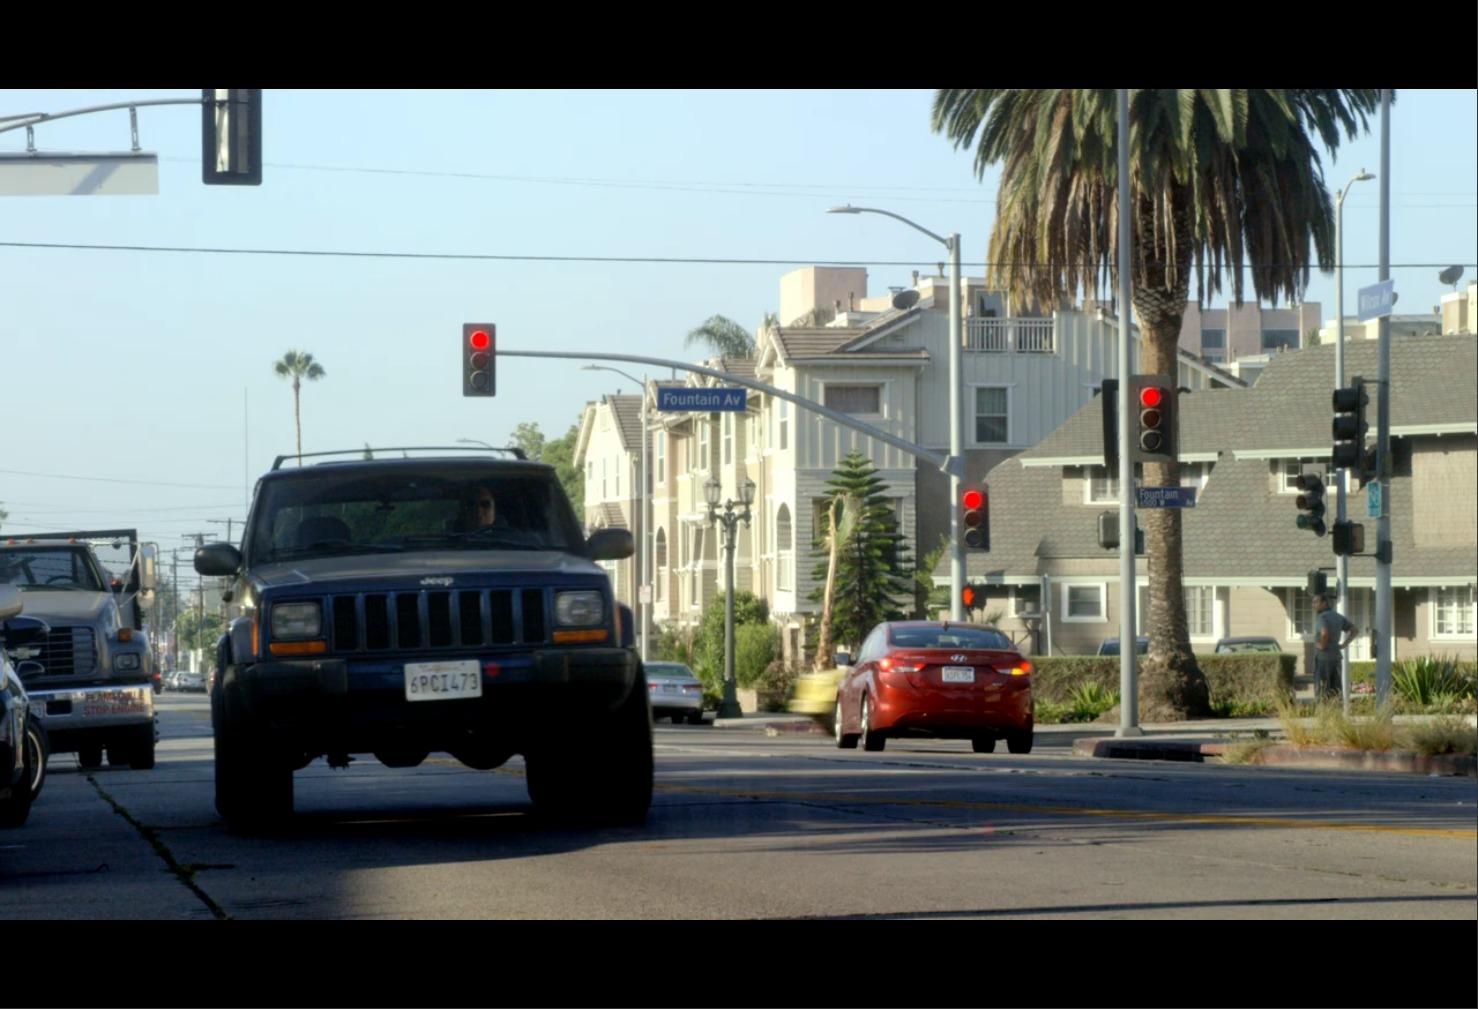 AmazonプライムビデオBOSCH通りを走る車の画像